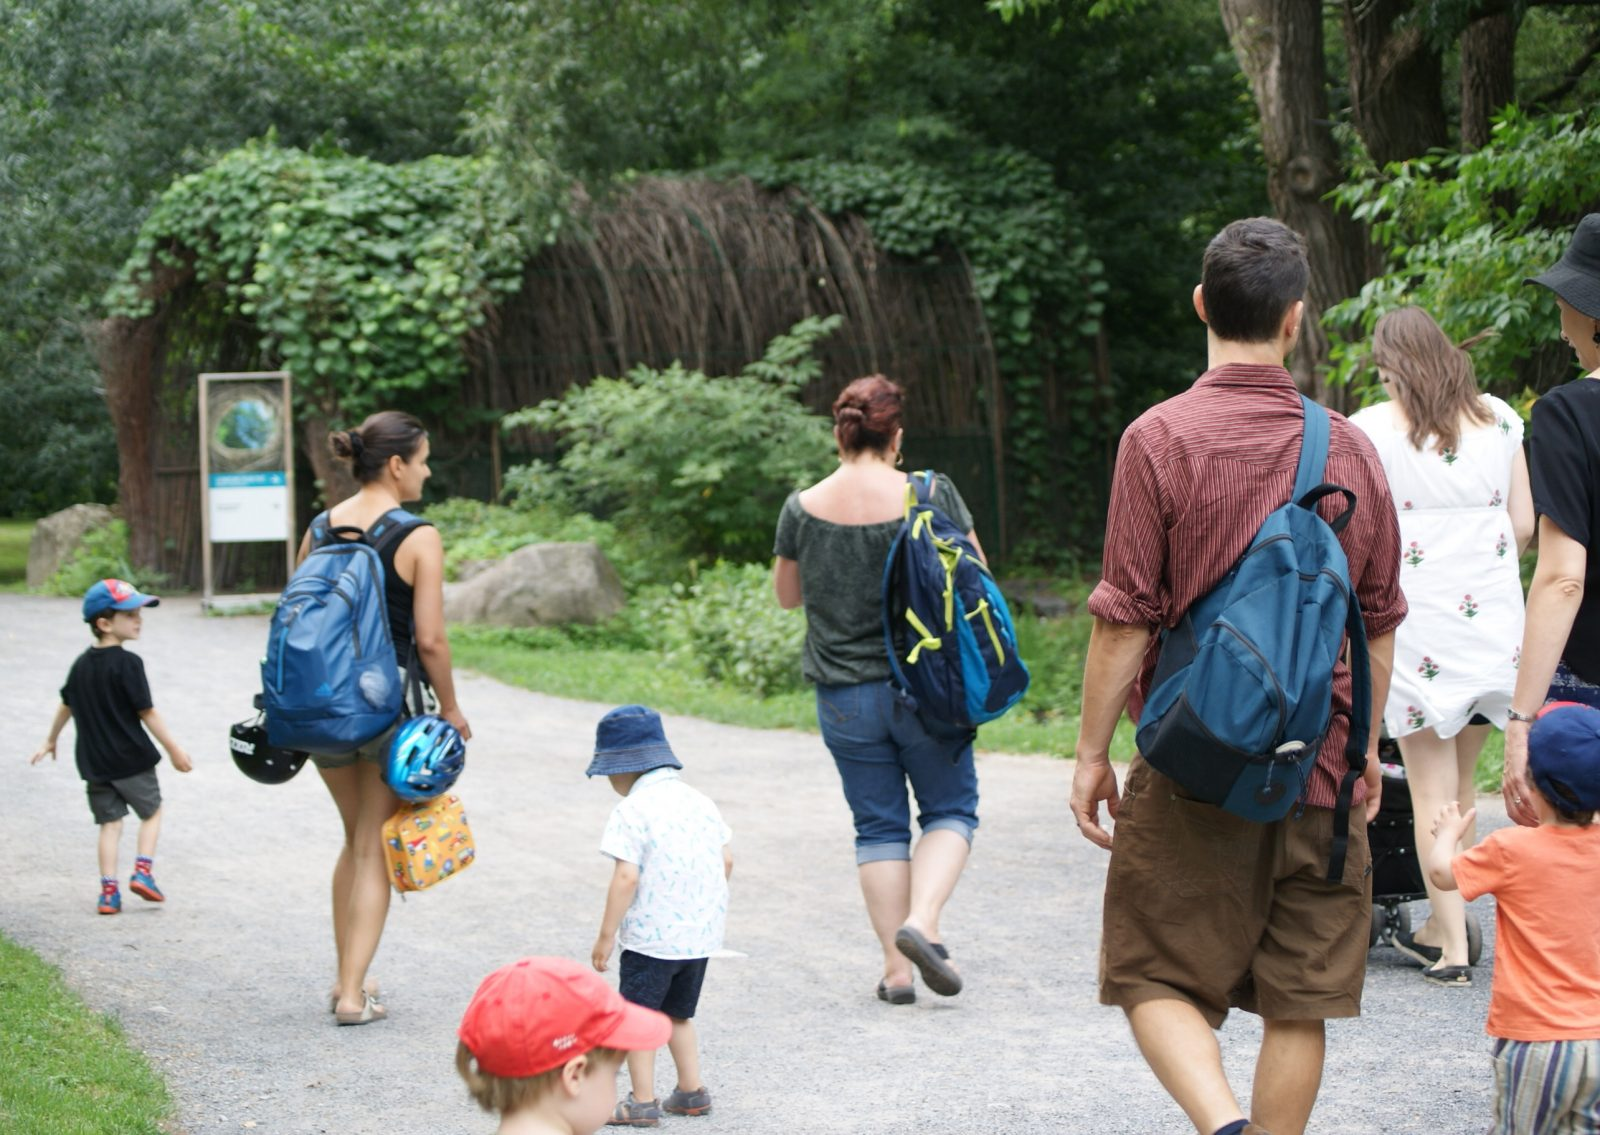 La Pirouette families at the Botanical Garden